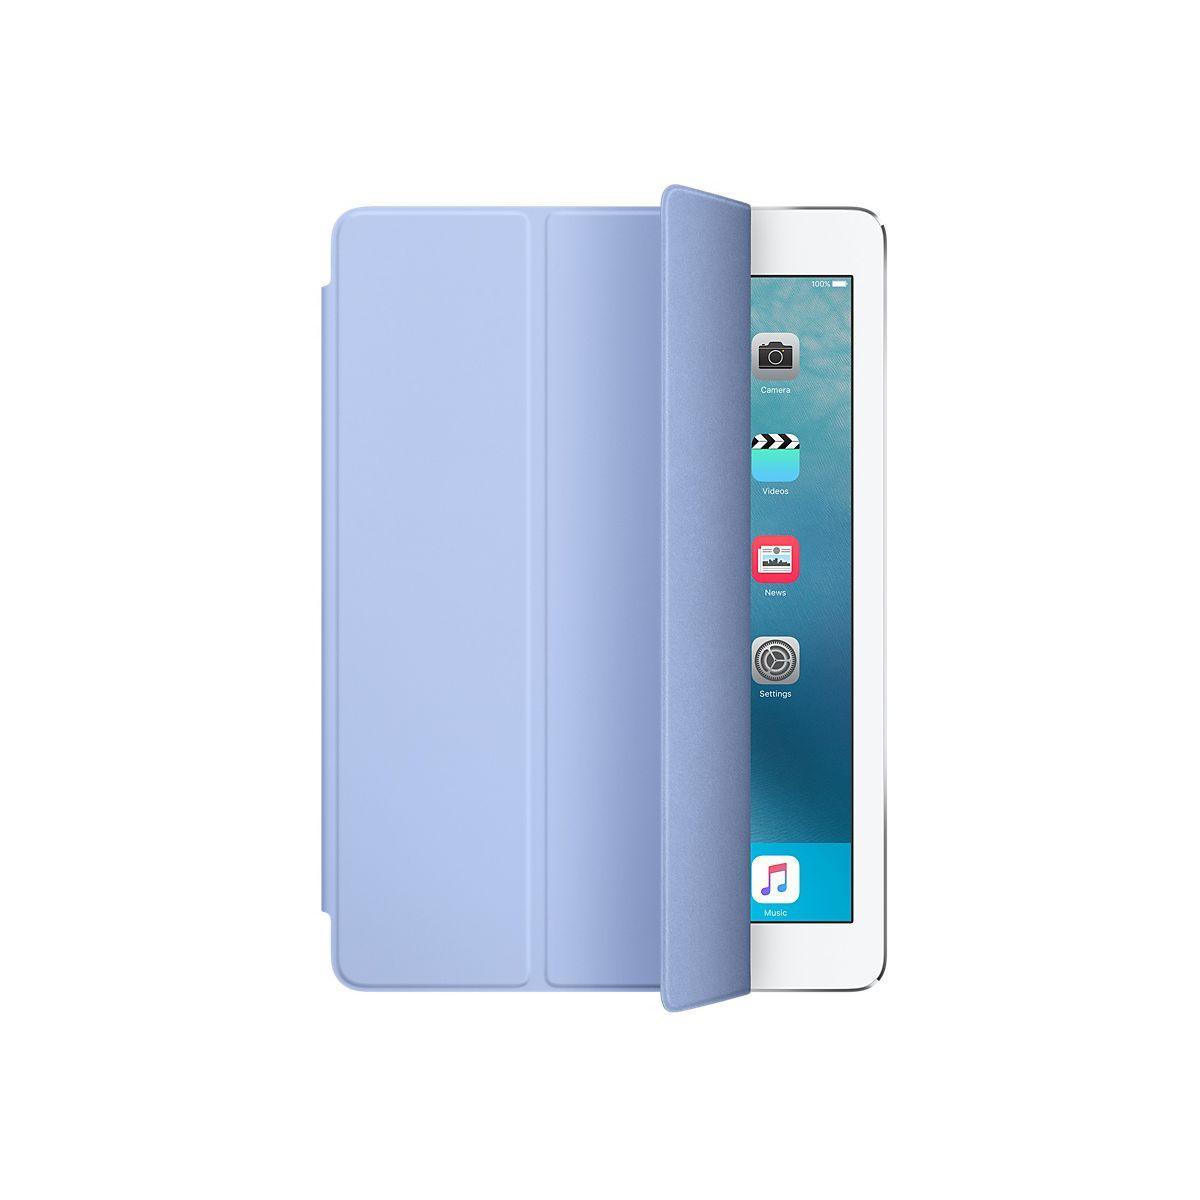 Folio apple smart cover lilas ipad pro 9,7'' - livraison offerte : code chronoff (photo)